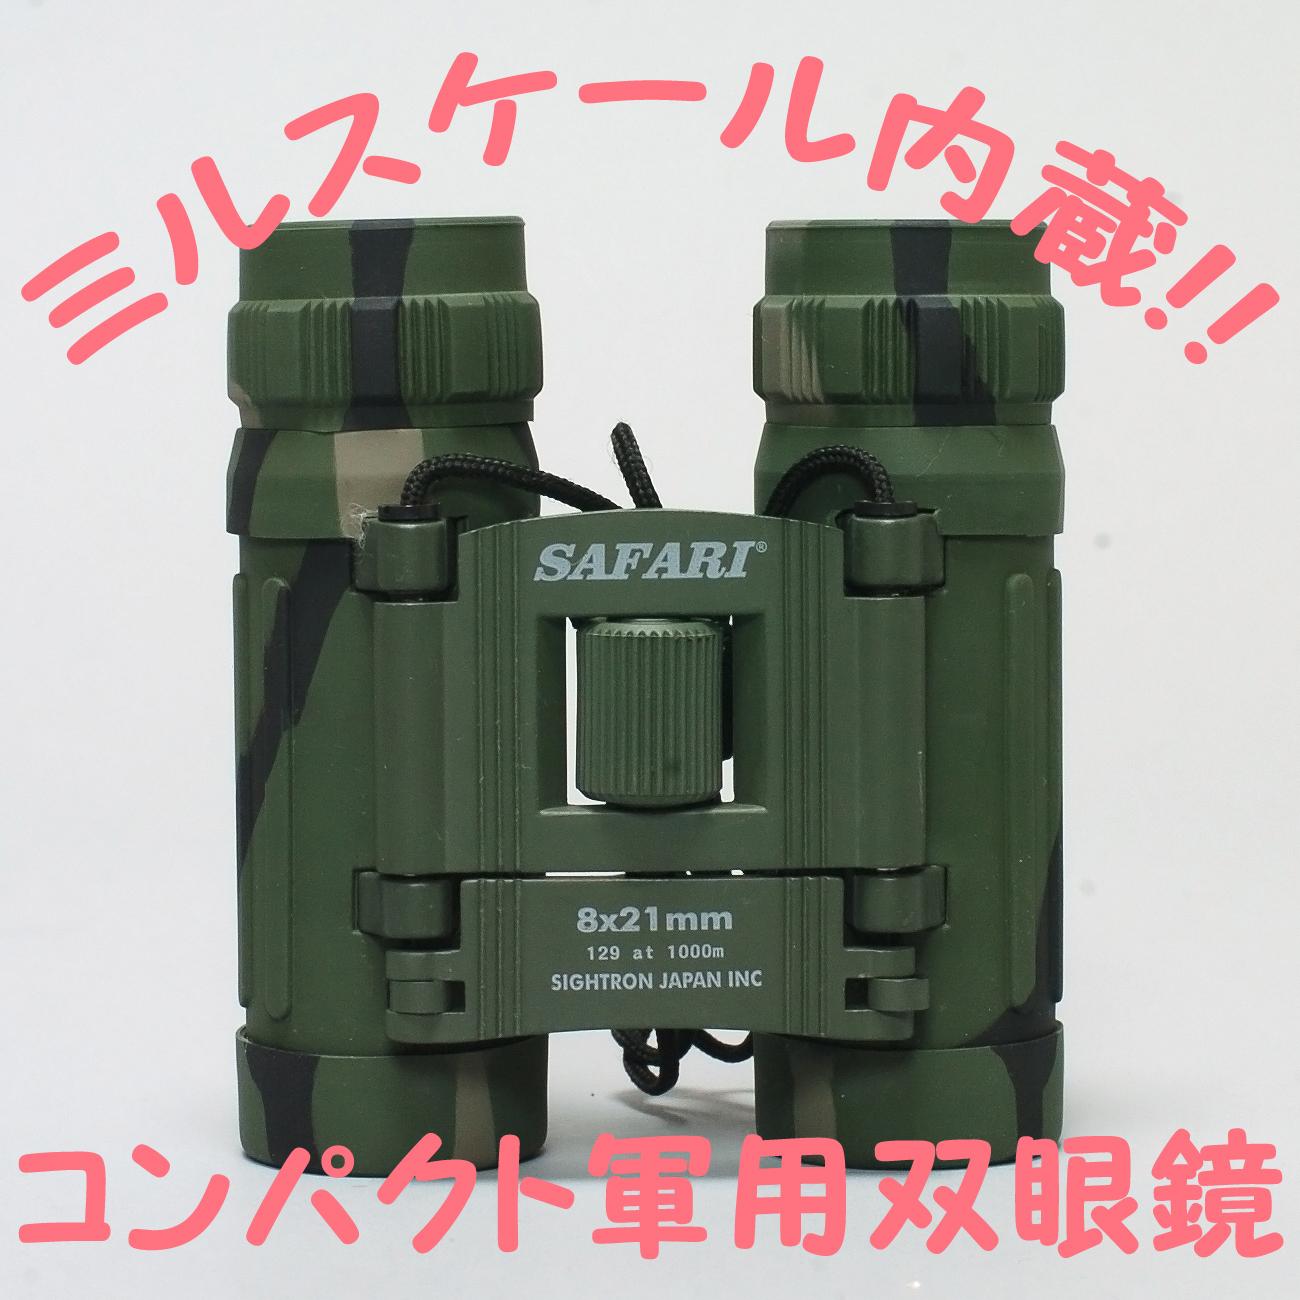 SAFARIサファリ ミルスケール内蔵双眼鏡 TAS-SA821